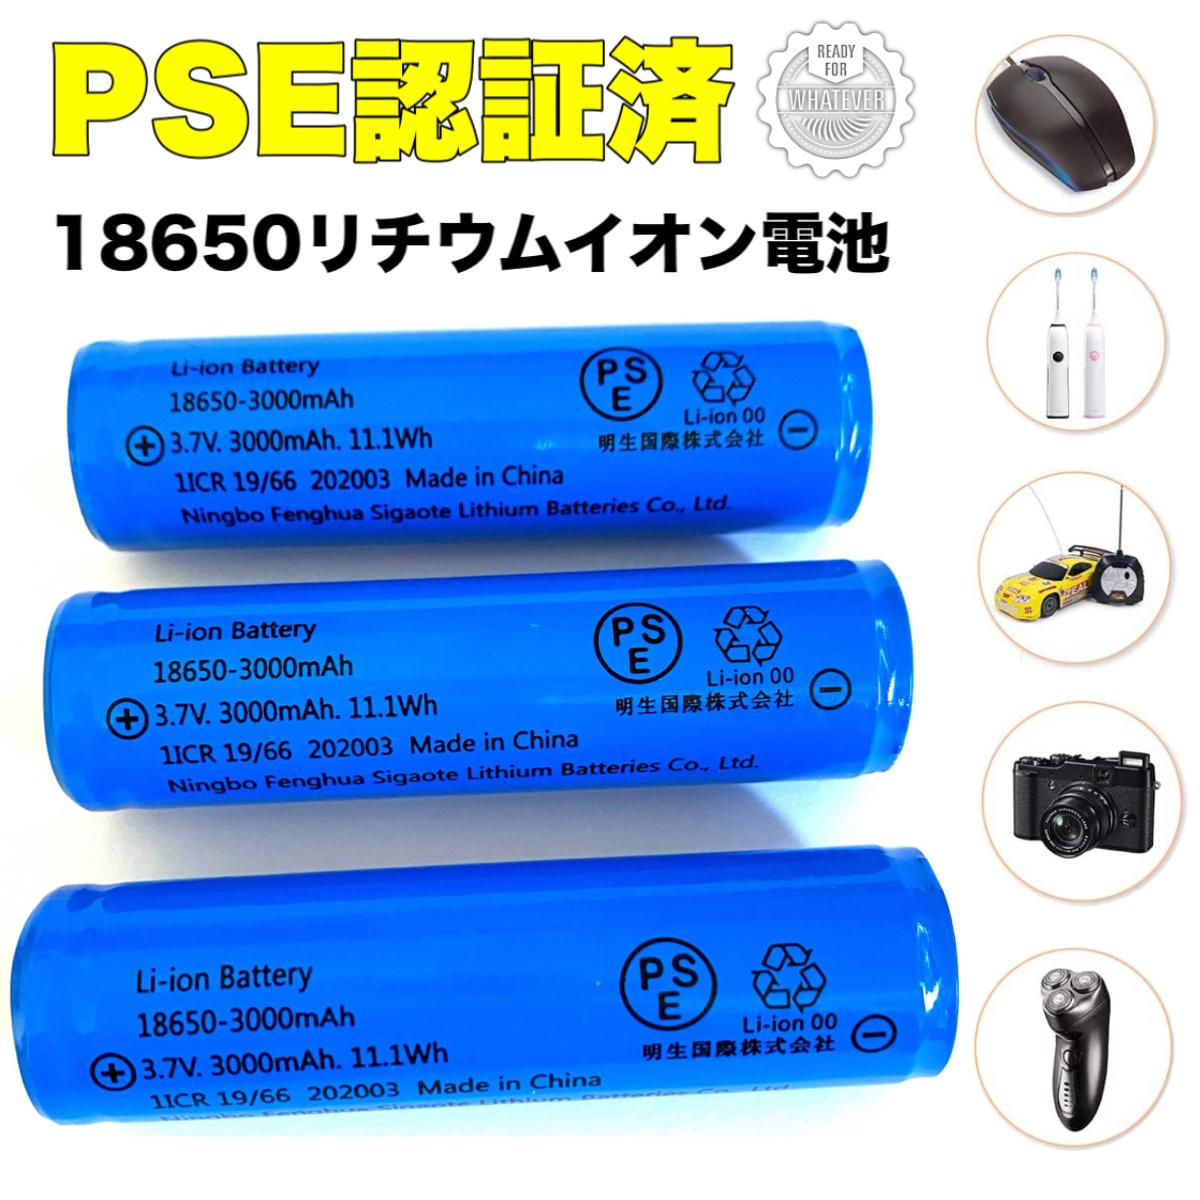 PSE認証済み 引出物 新着 大容量3000mAh 18650リチウムイオンバッテリー 充電池1本 3.7V充電式バッテリー LED懐中電灯用ヘッドライト用 電化製品用 大容量3000mAh保護回路付